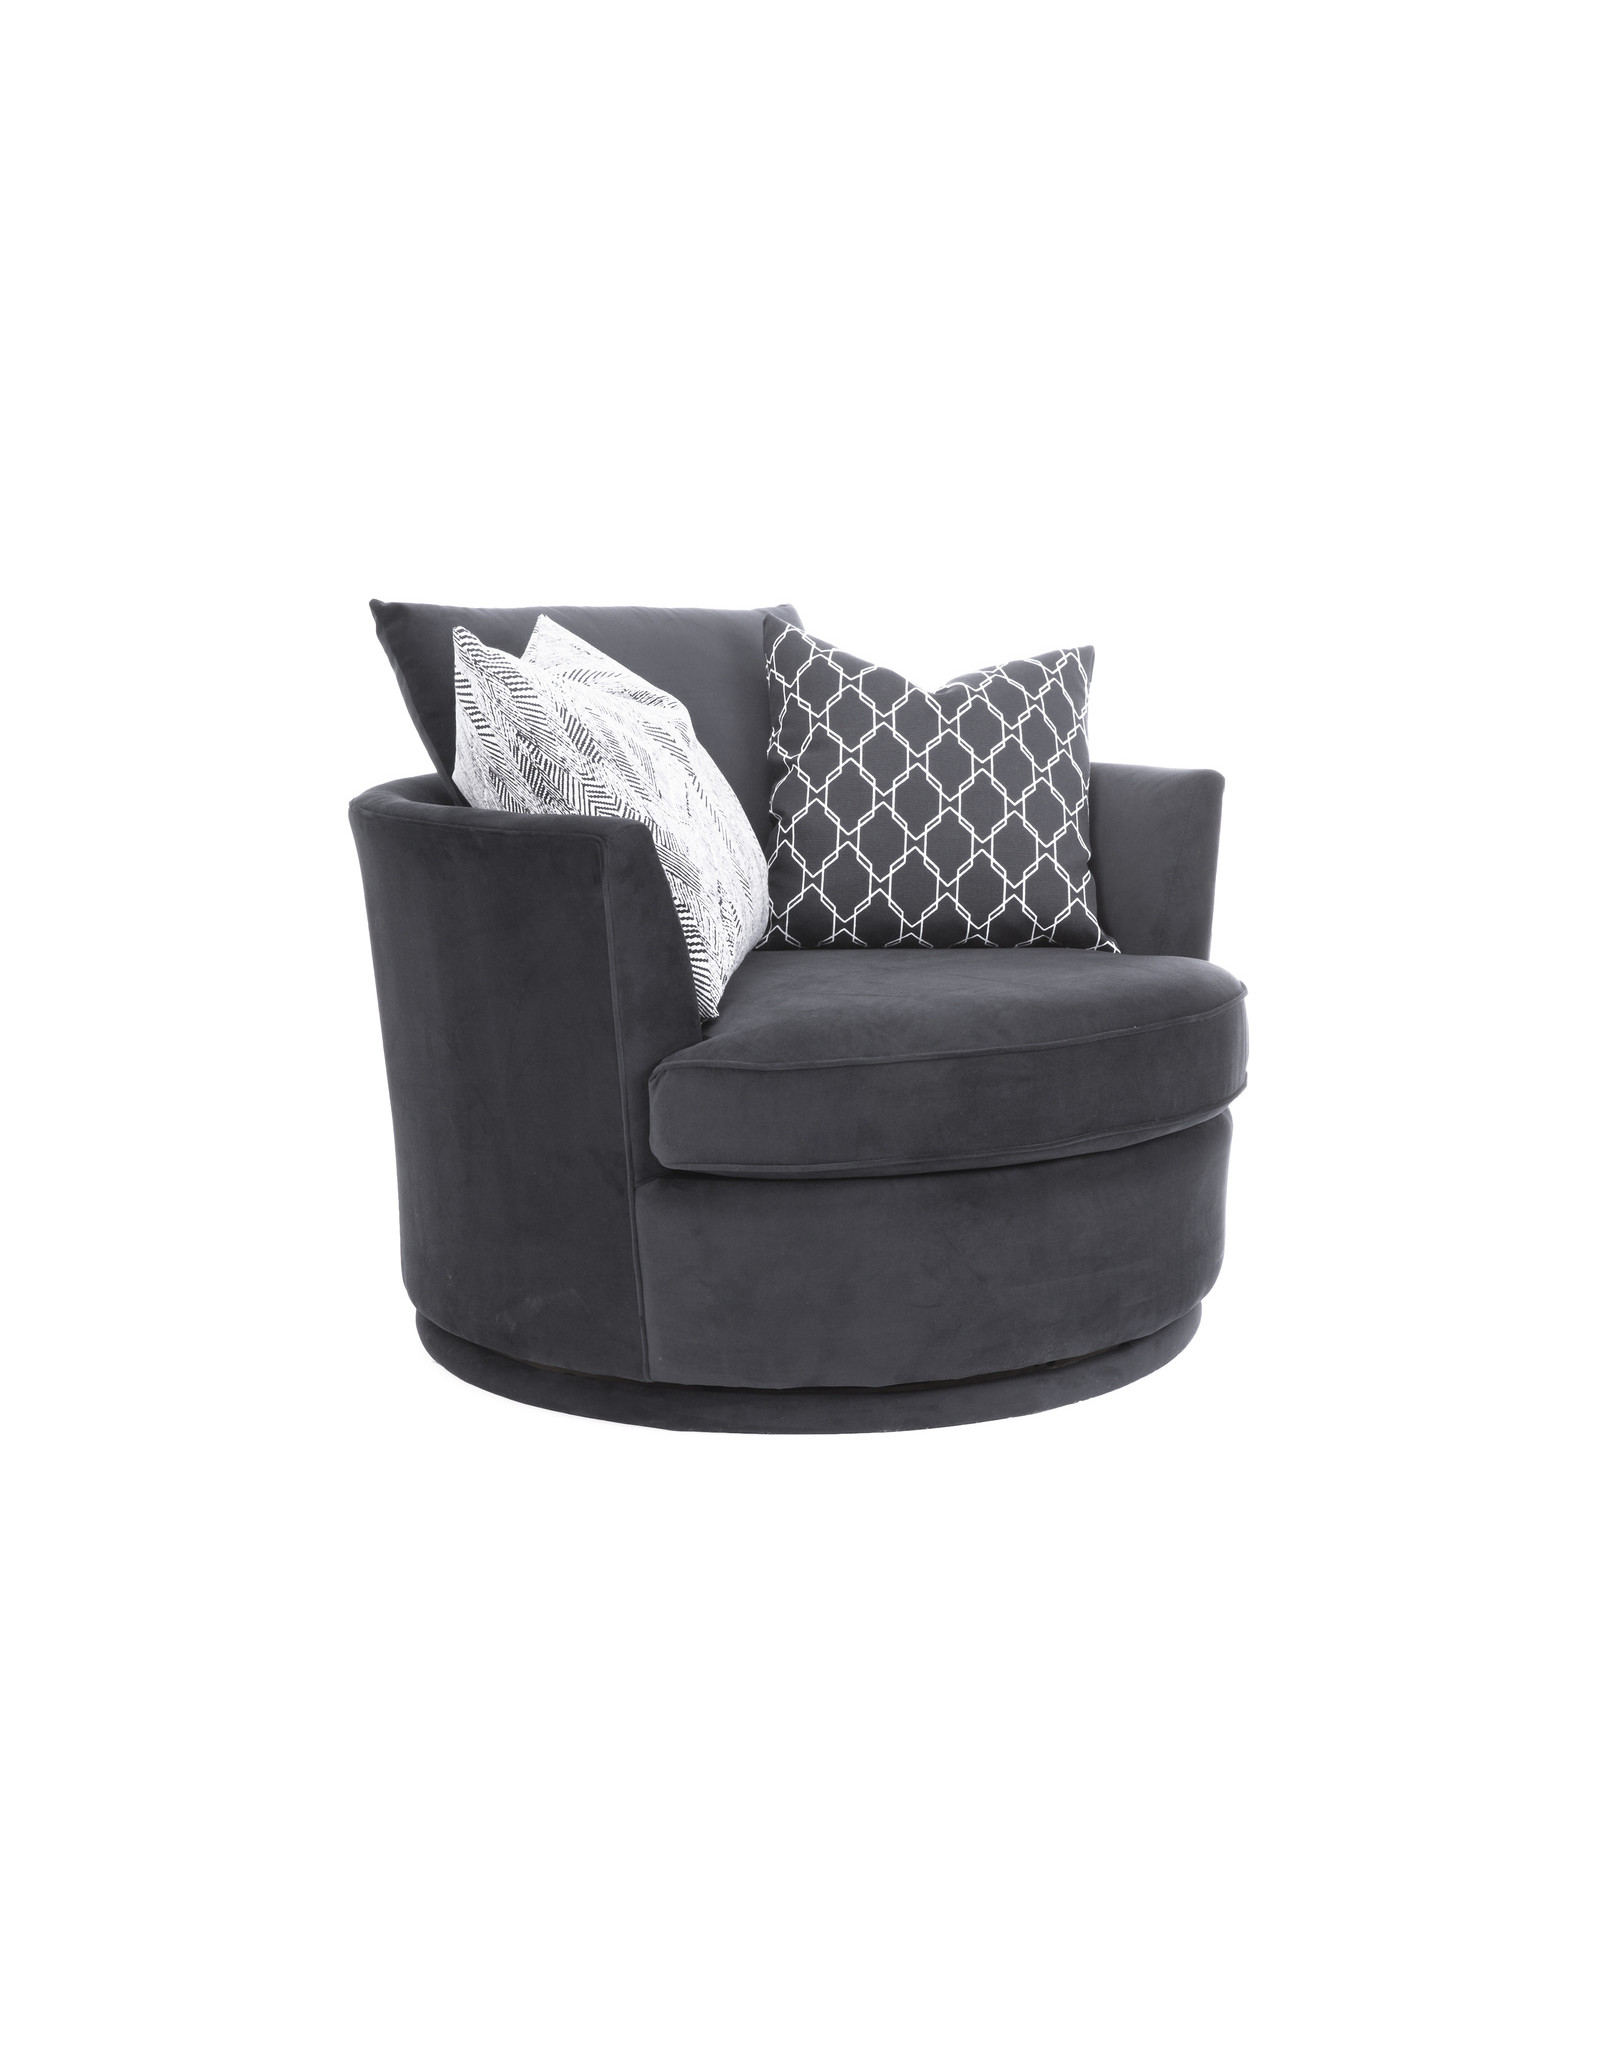 "TCE 2991 46"" Swivel Chair"